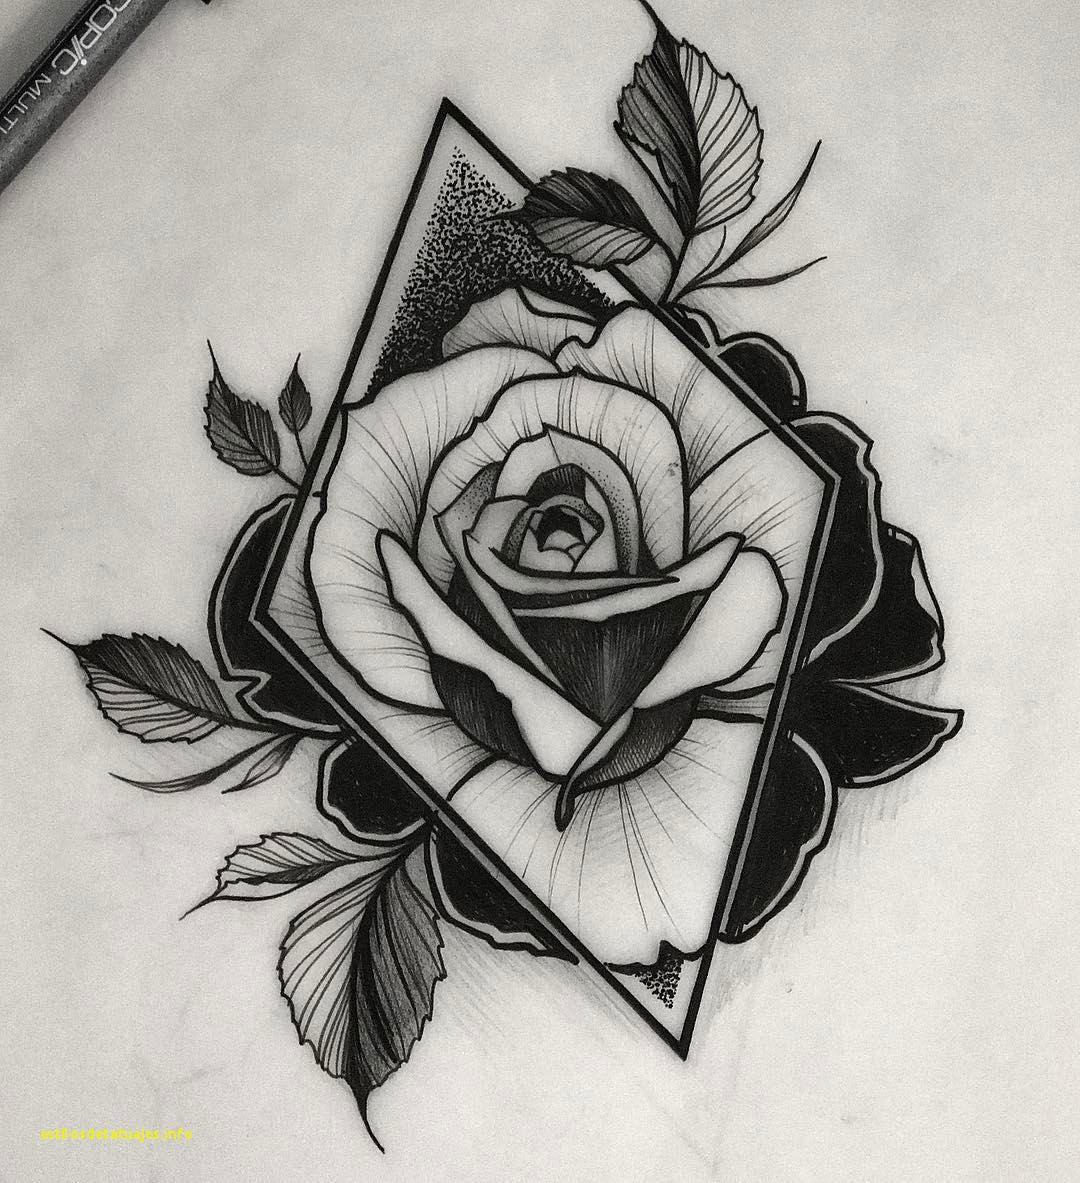 Resultado De Imagen Para Moldes De Tatuajes Para Hombres Tatuajes De Rosas Tatuaje Neotradicional Dibujos Para Tatuar